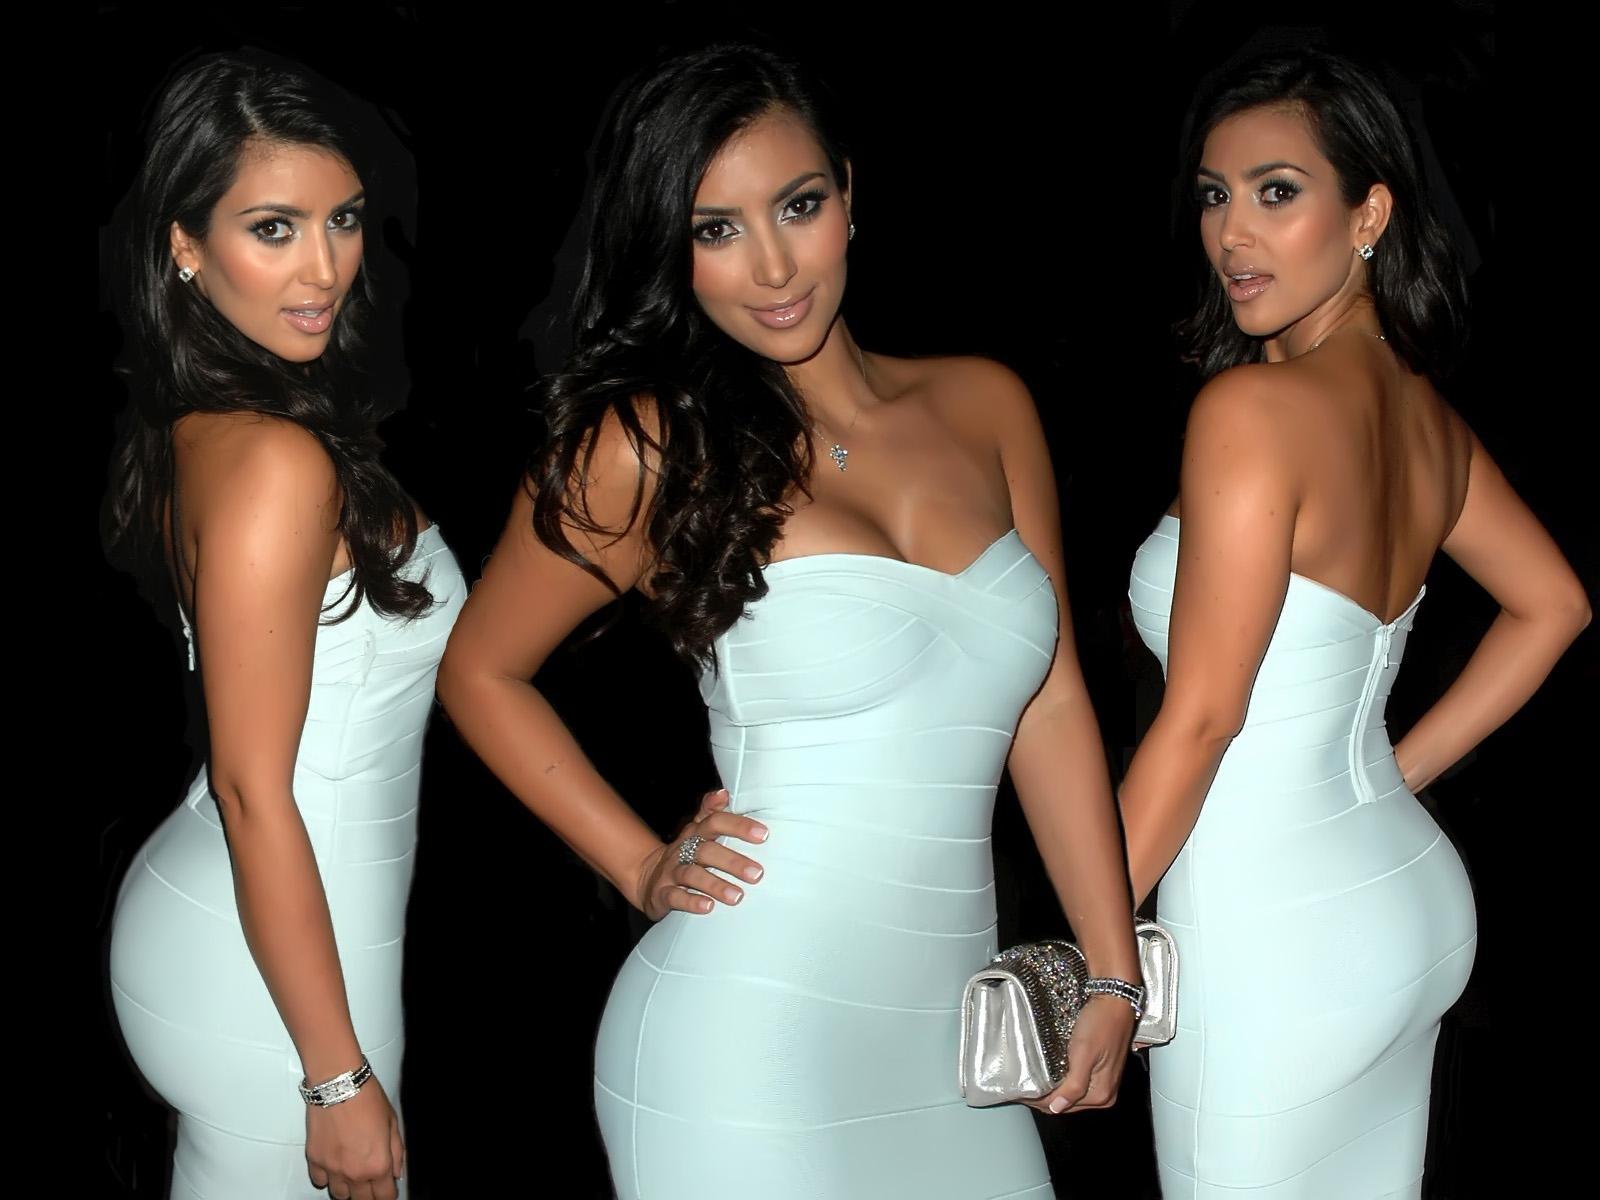 http://4.bp.blogspot.com/-EfbconQH06Y/T4dDMzG_9TI/AAAAAAAAAFA/BdC2kj-0mEk/s1600/Kim-Kardashian-002.jpg